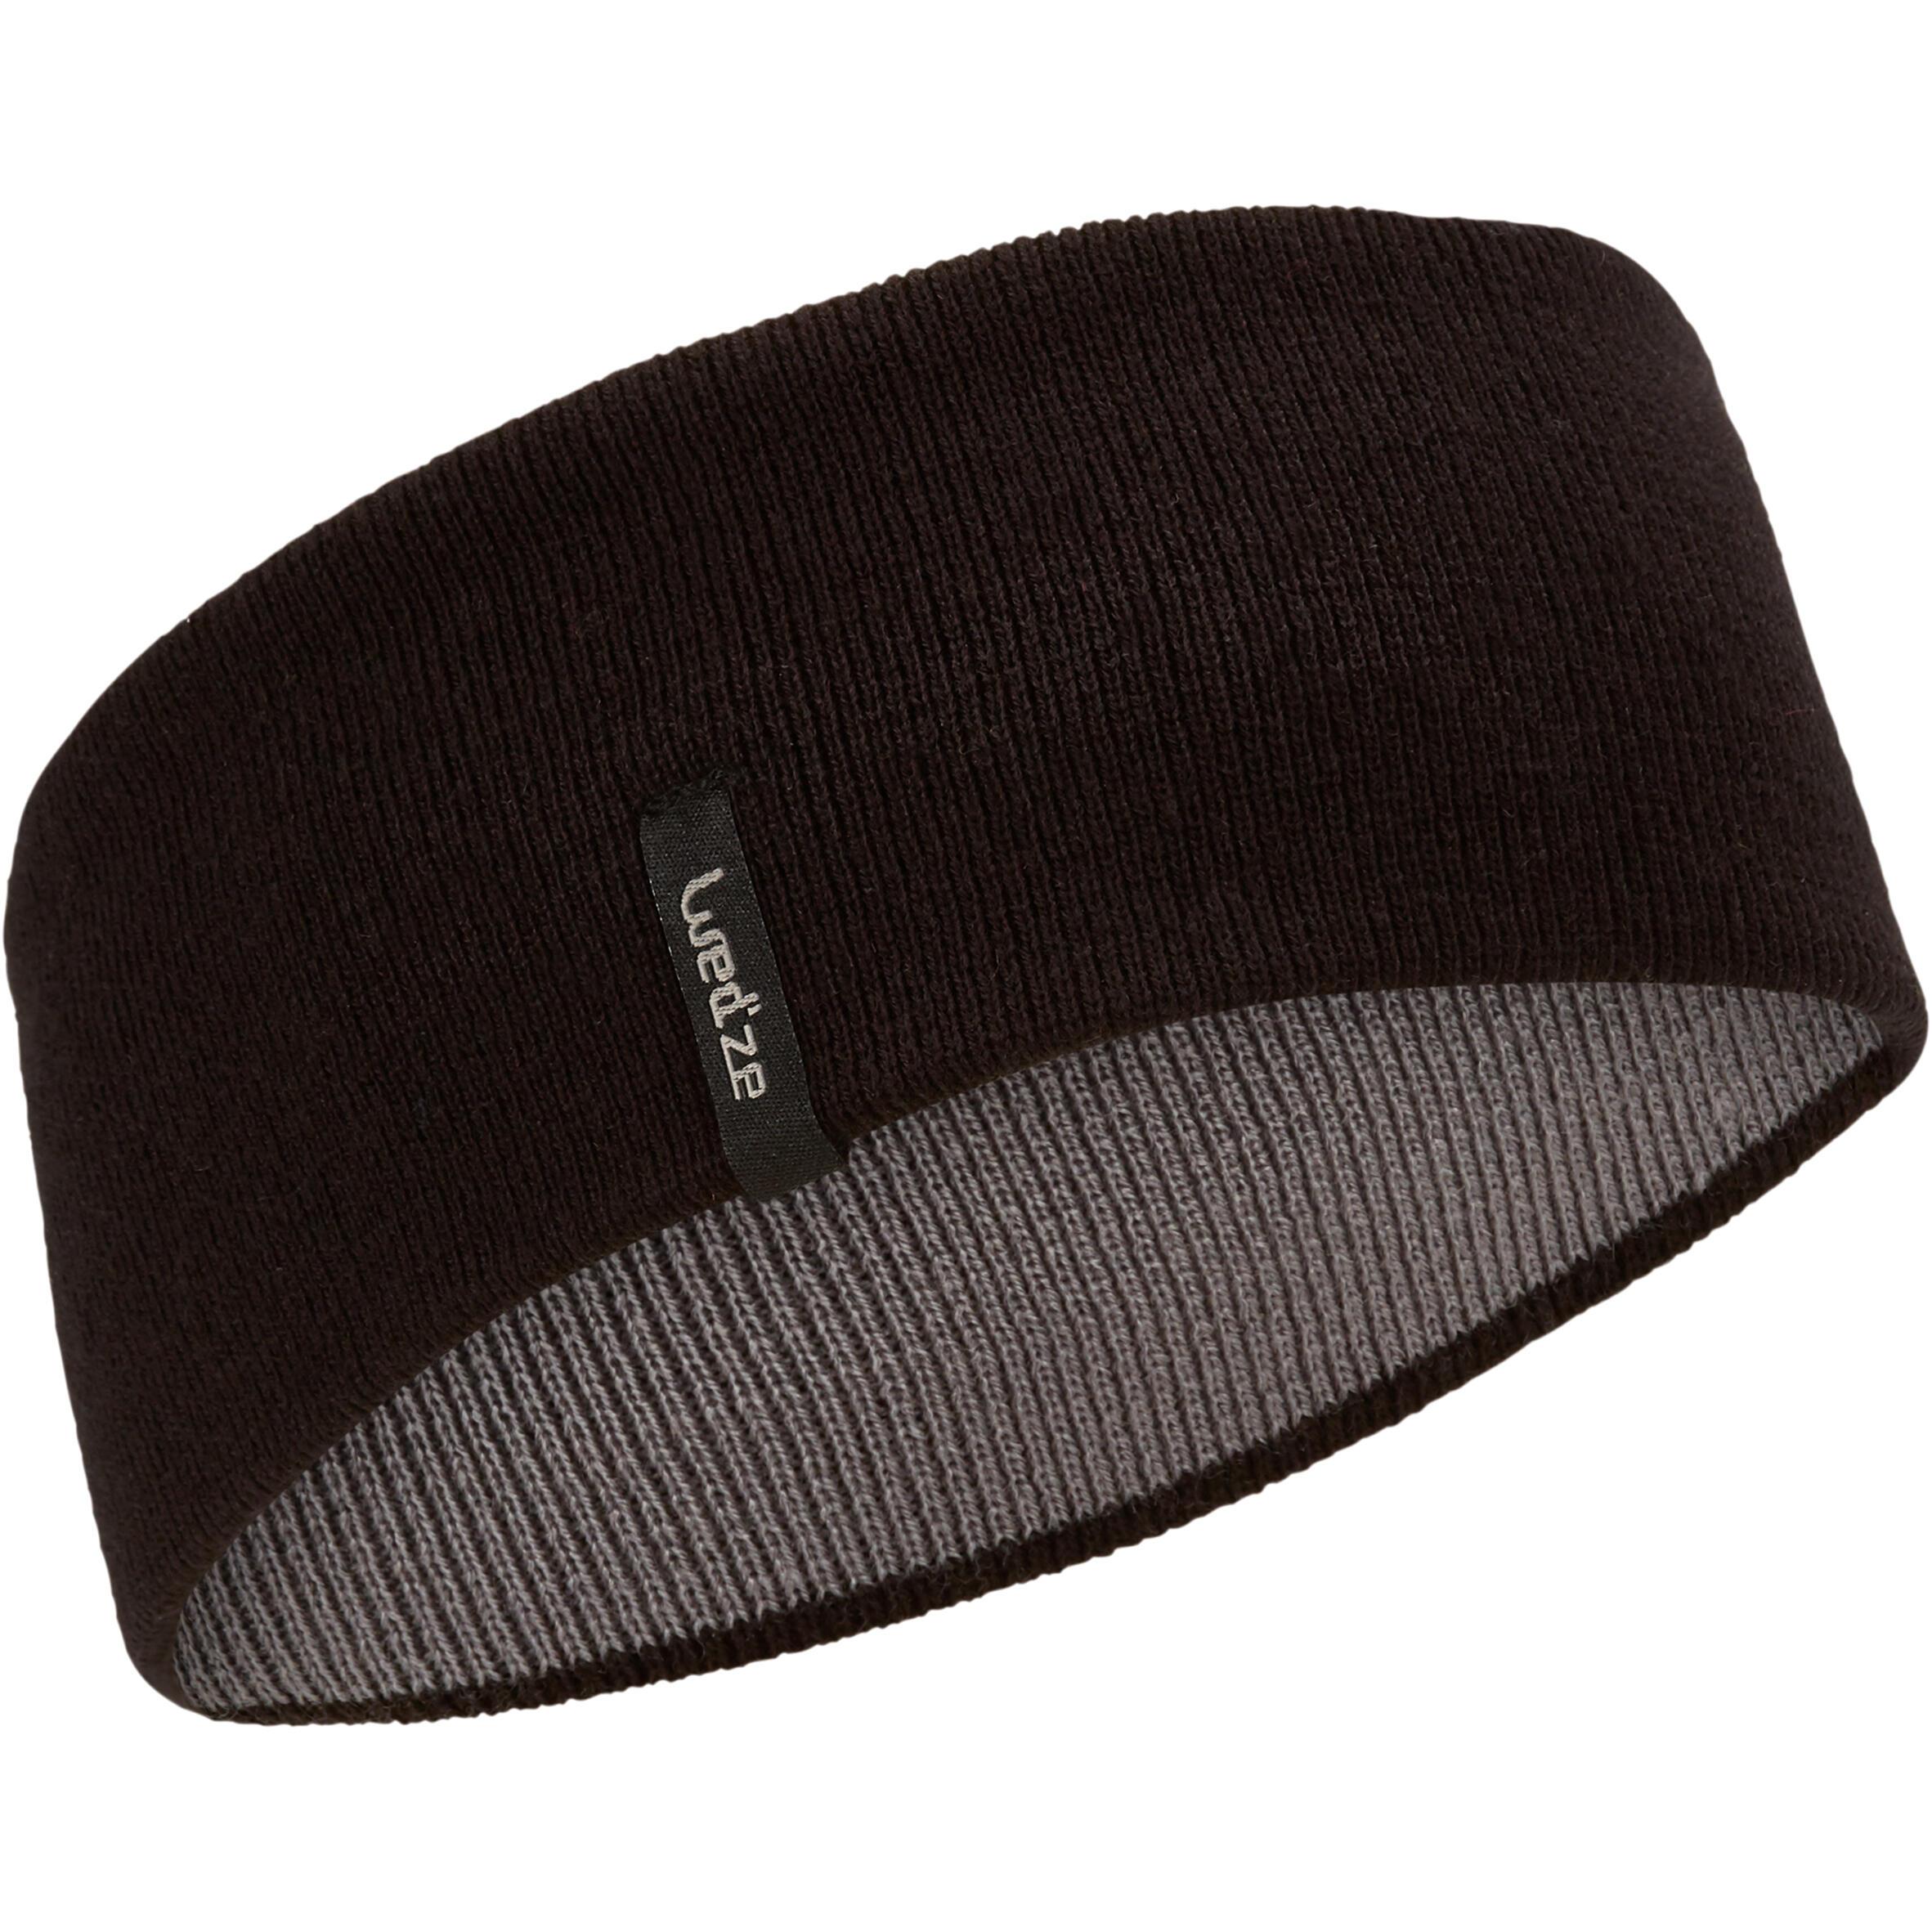 Adult Reverse Ski Headband - Black Grey